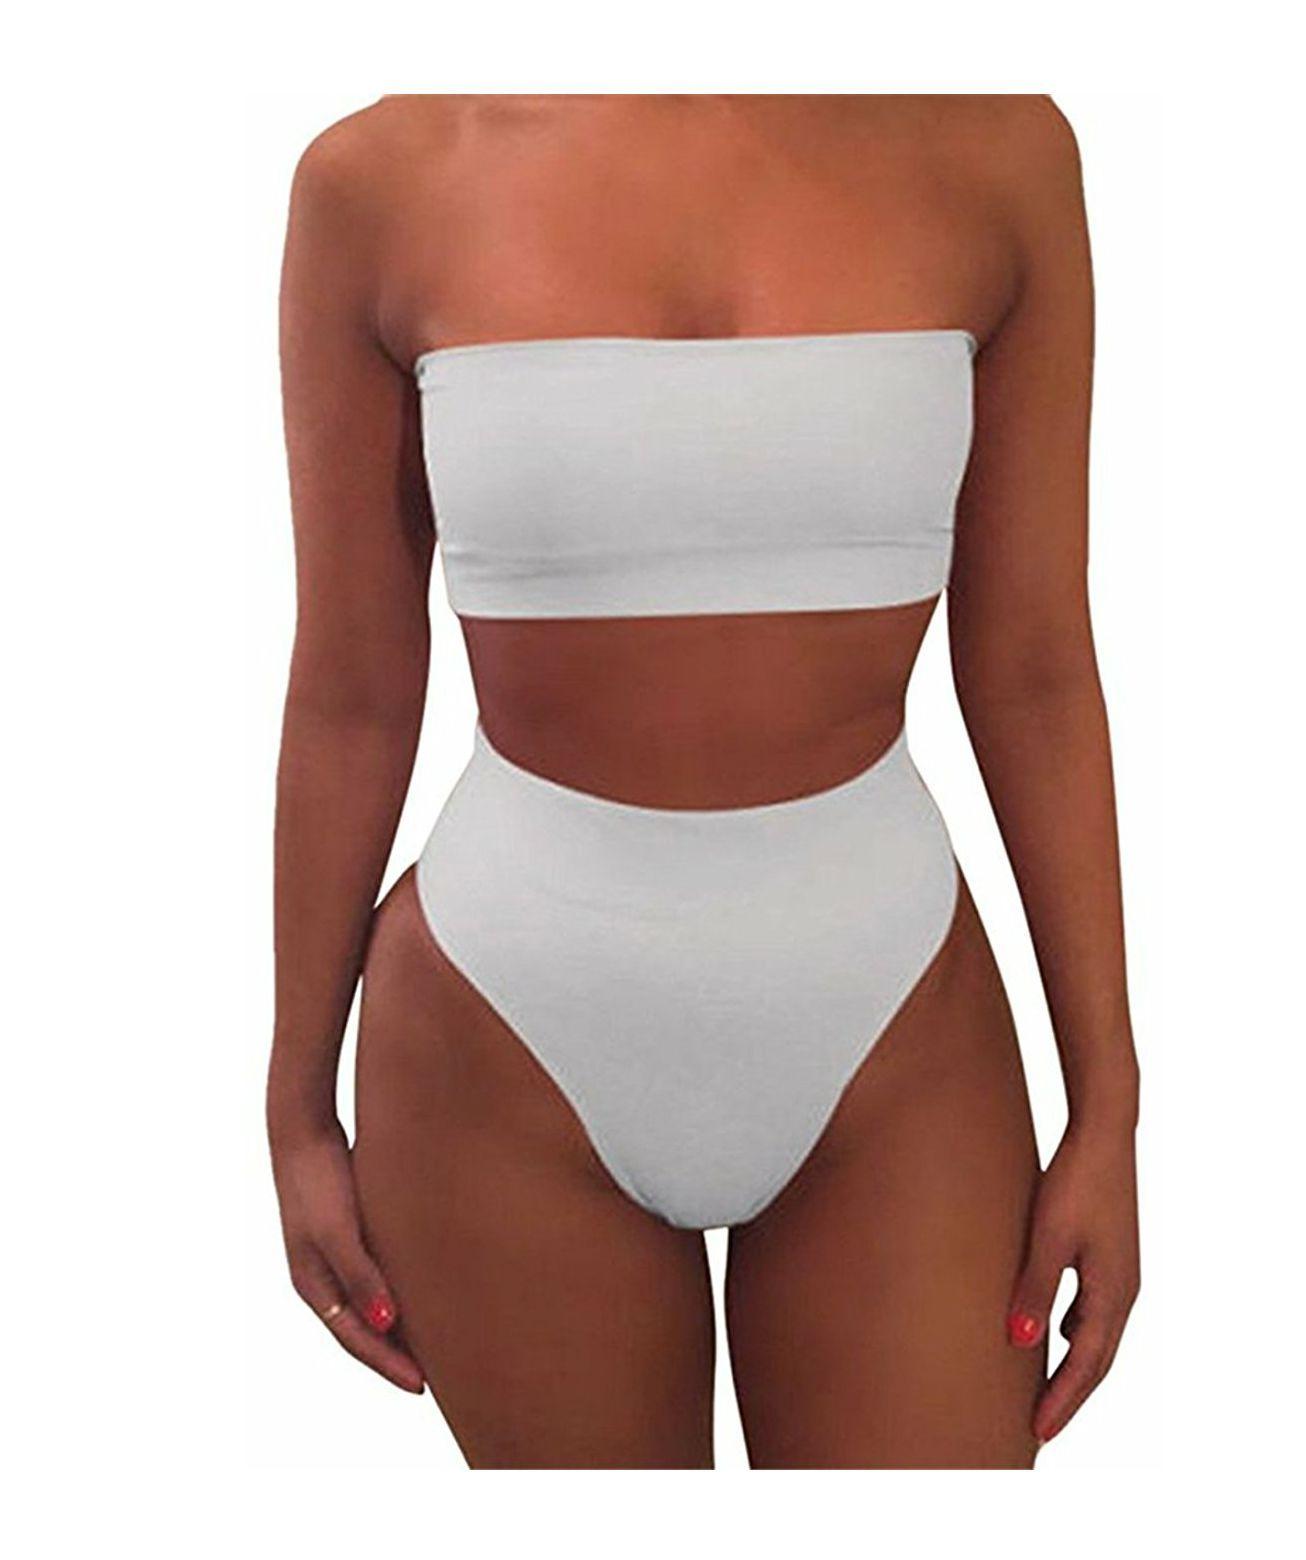 c23dffc2b0 Two Piece Tube Top Bikini | $*Clothes*$ | Bandeau bikini set ...